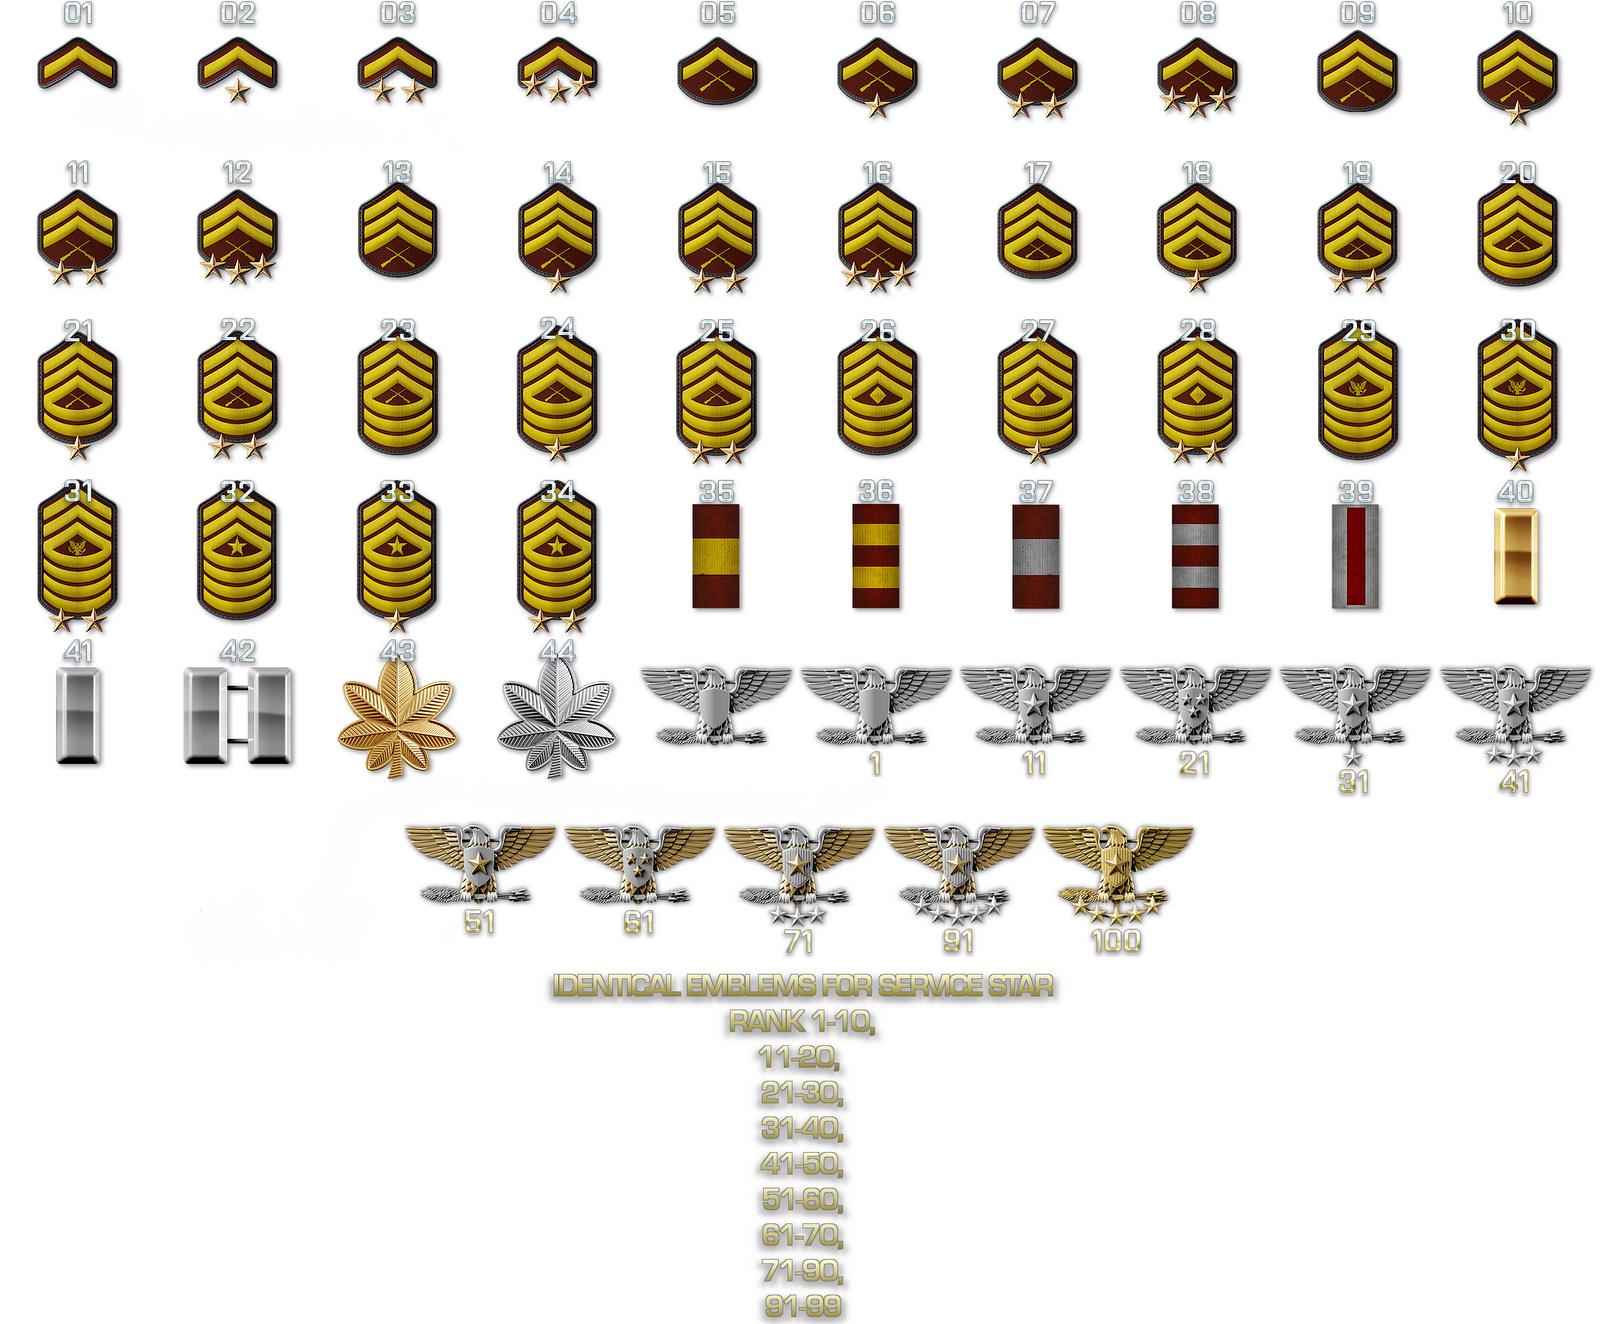 CLÃ OZ_CAVEIRAS: Patentes Battlefield 3